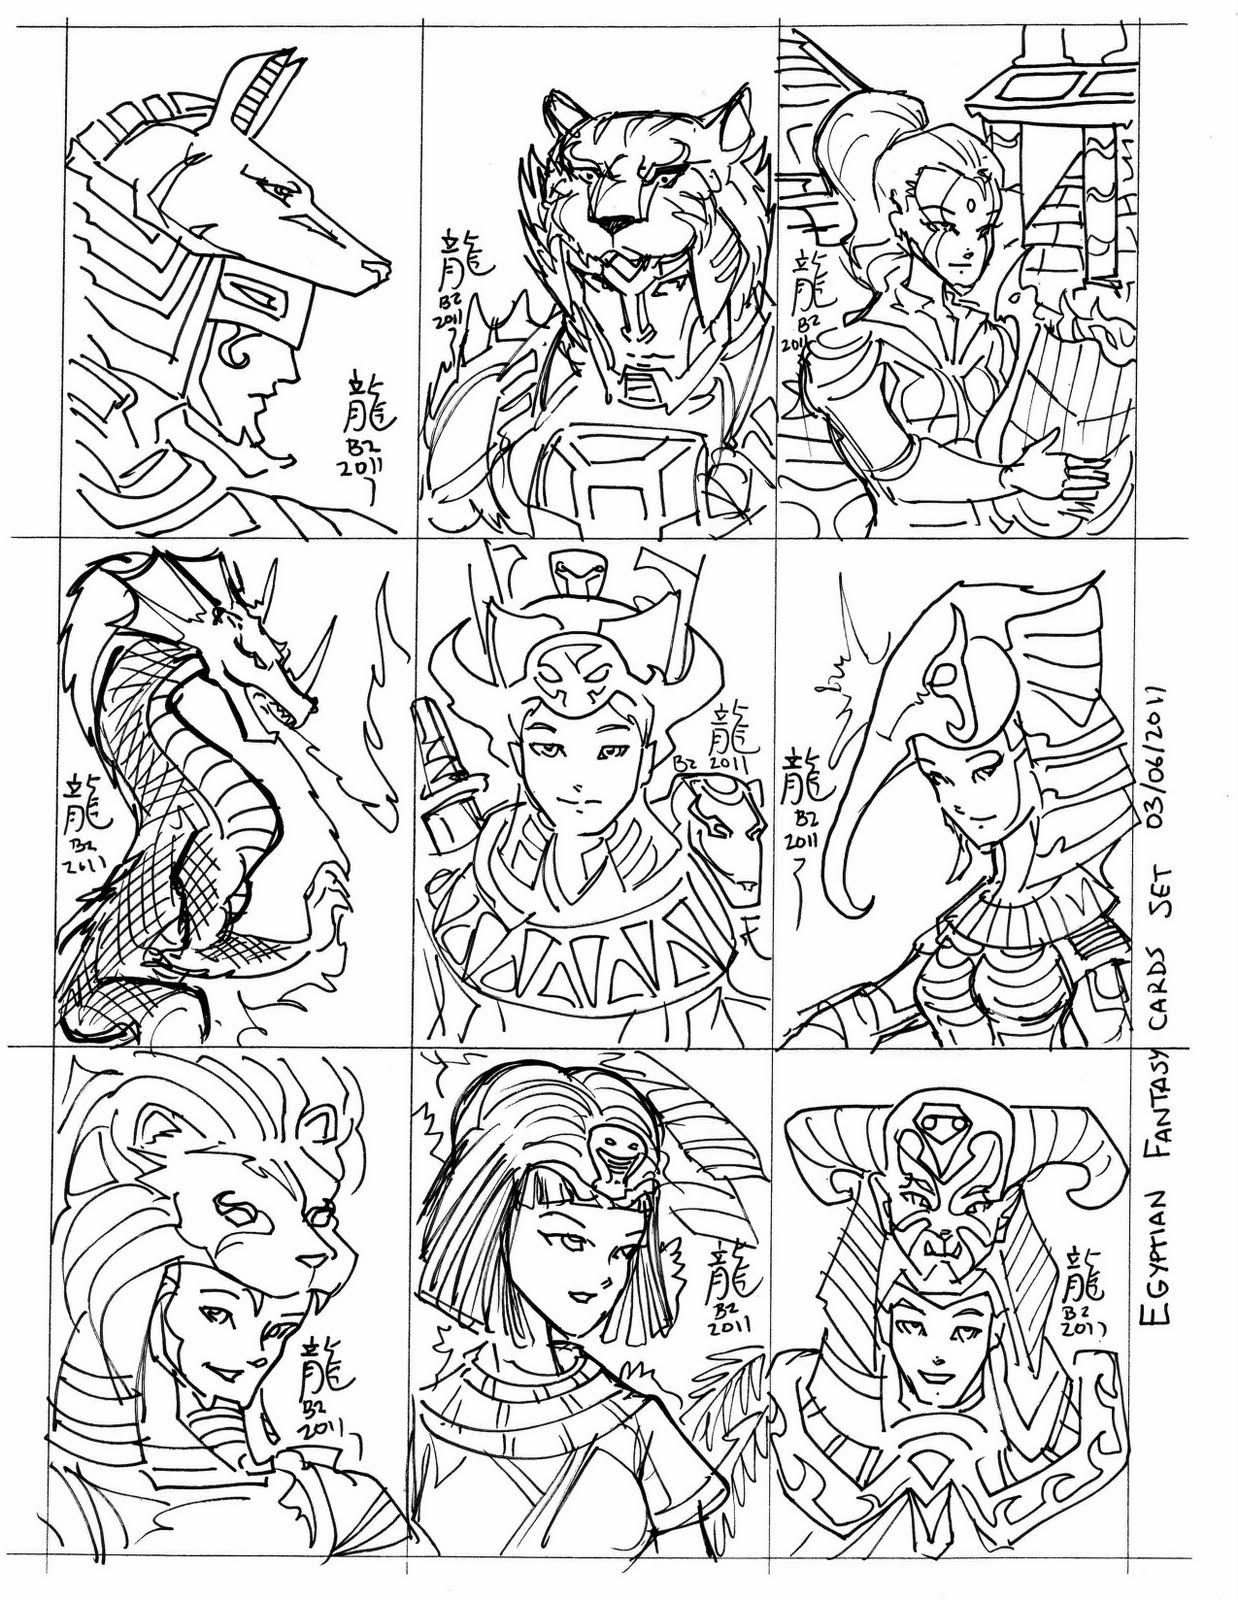 Kid Sketches: 300 post wo-hoo! Free Coloring Sheets of ...